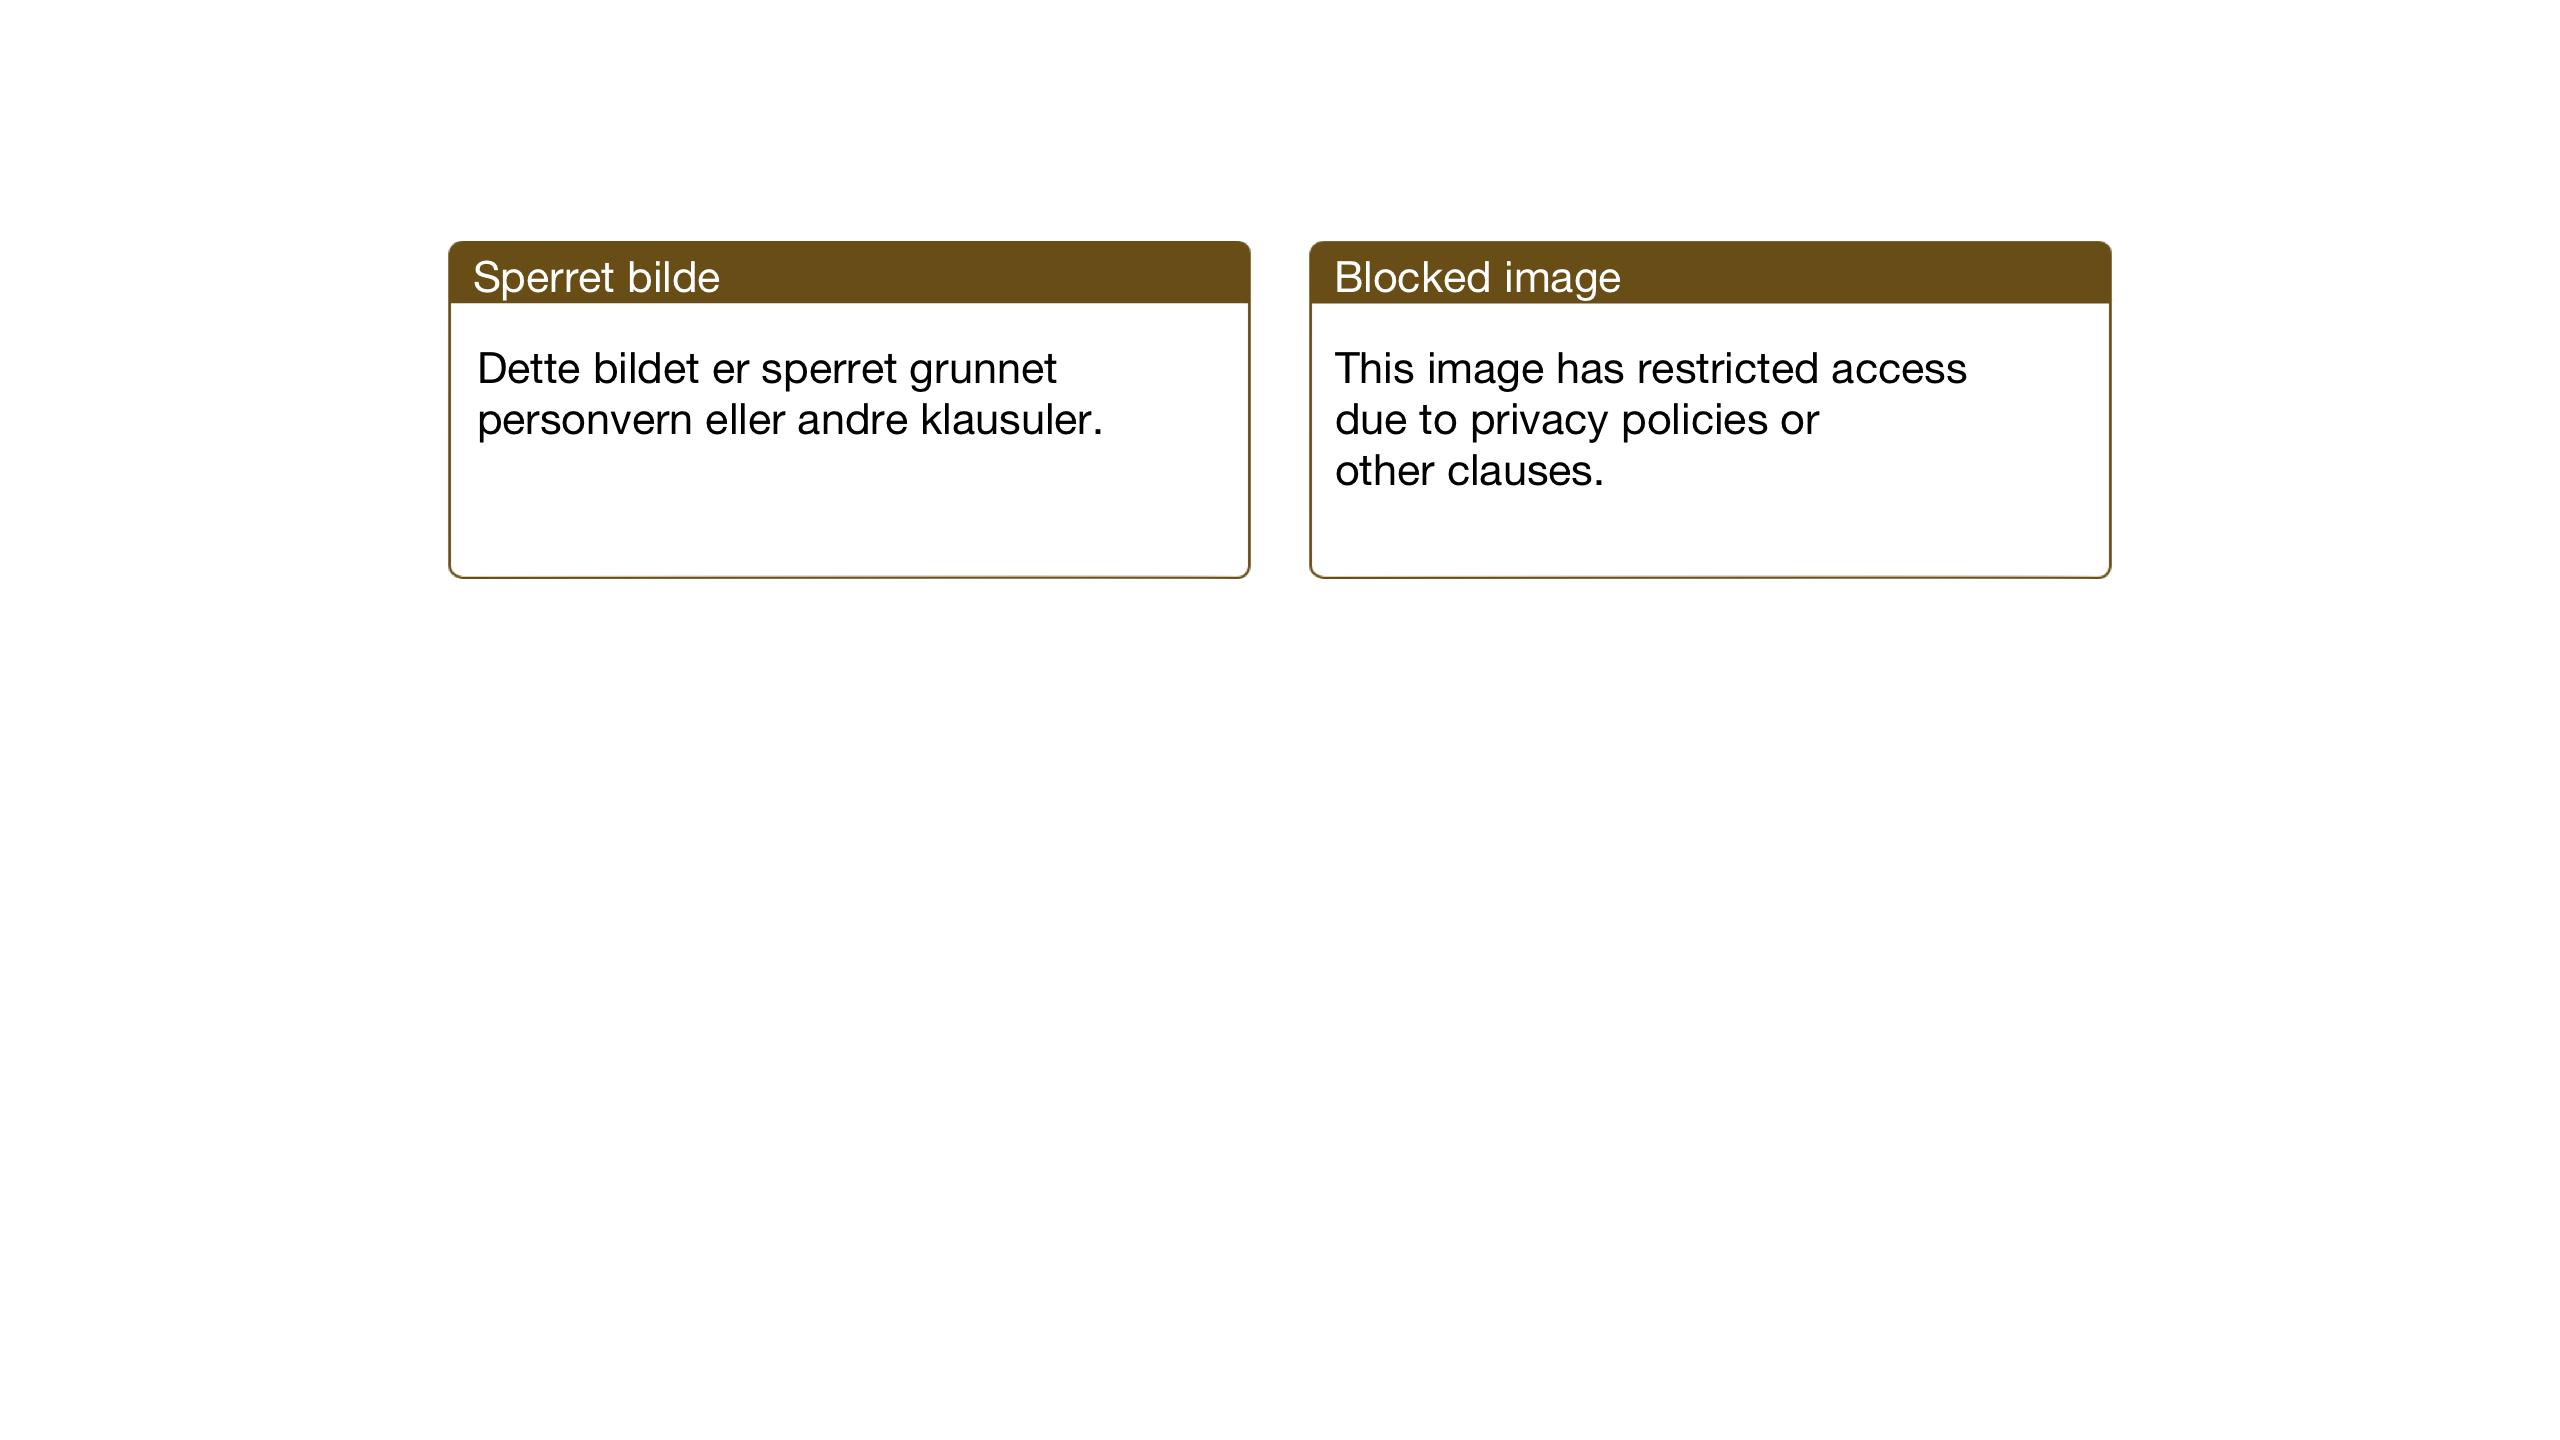 SAT, Ministerialprotokoller, klokkerbøker og fødselsregistre - Nordland, 849/L0699: Ministerialbok nr. 849A10, 1924-1937, s. 73